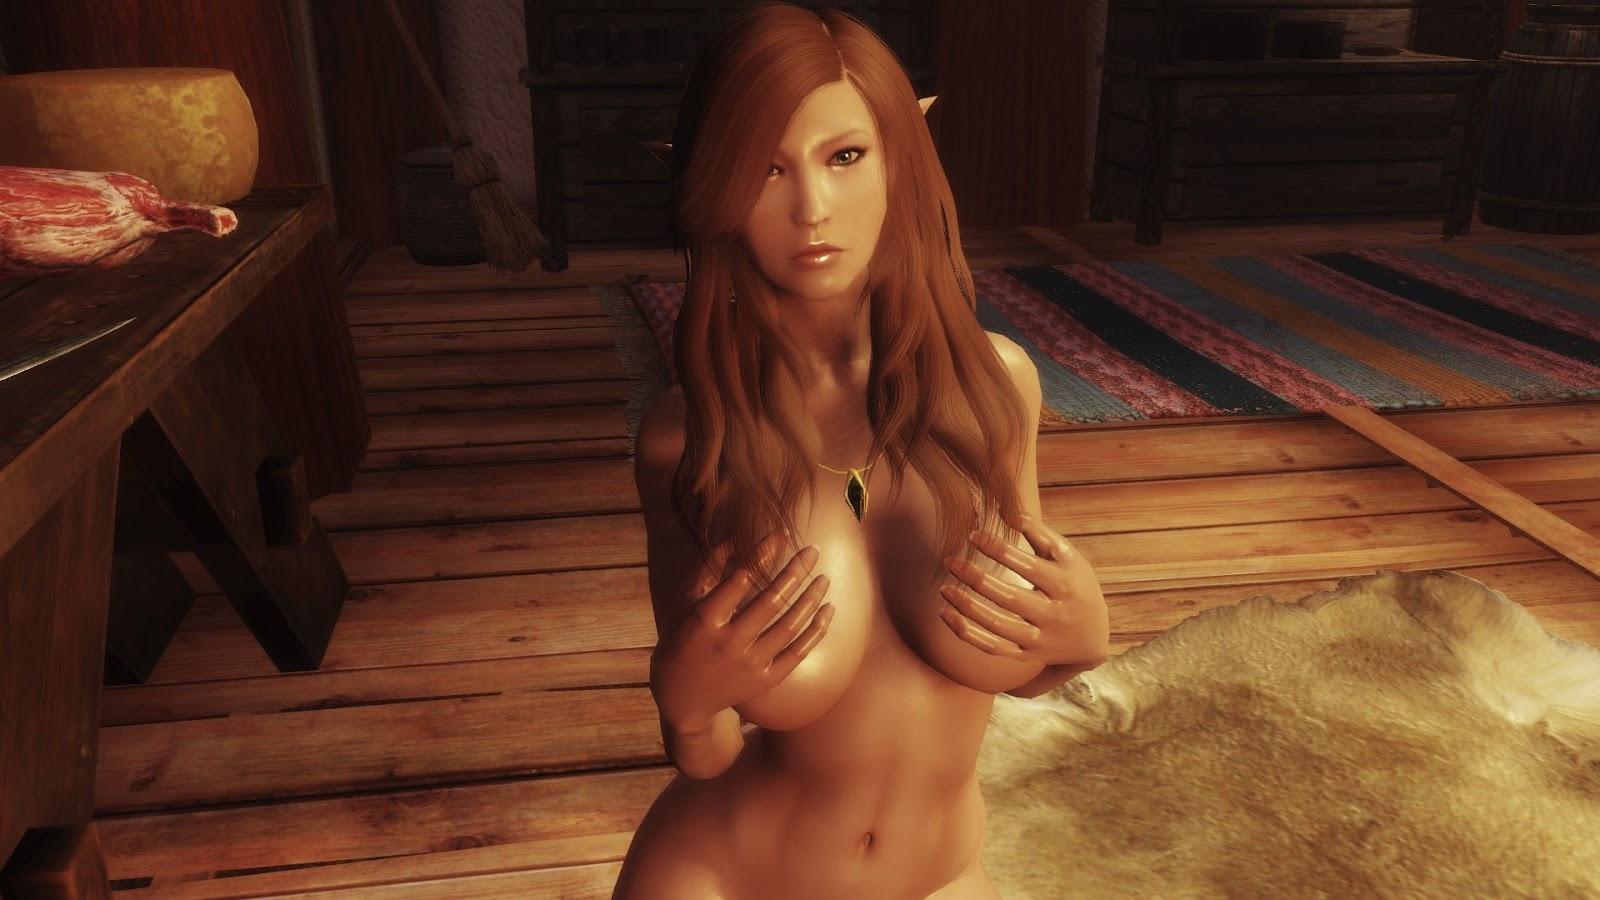 nude girls playing skyrim